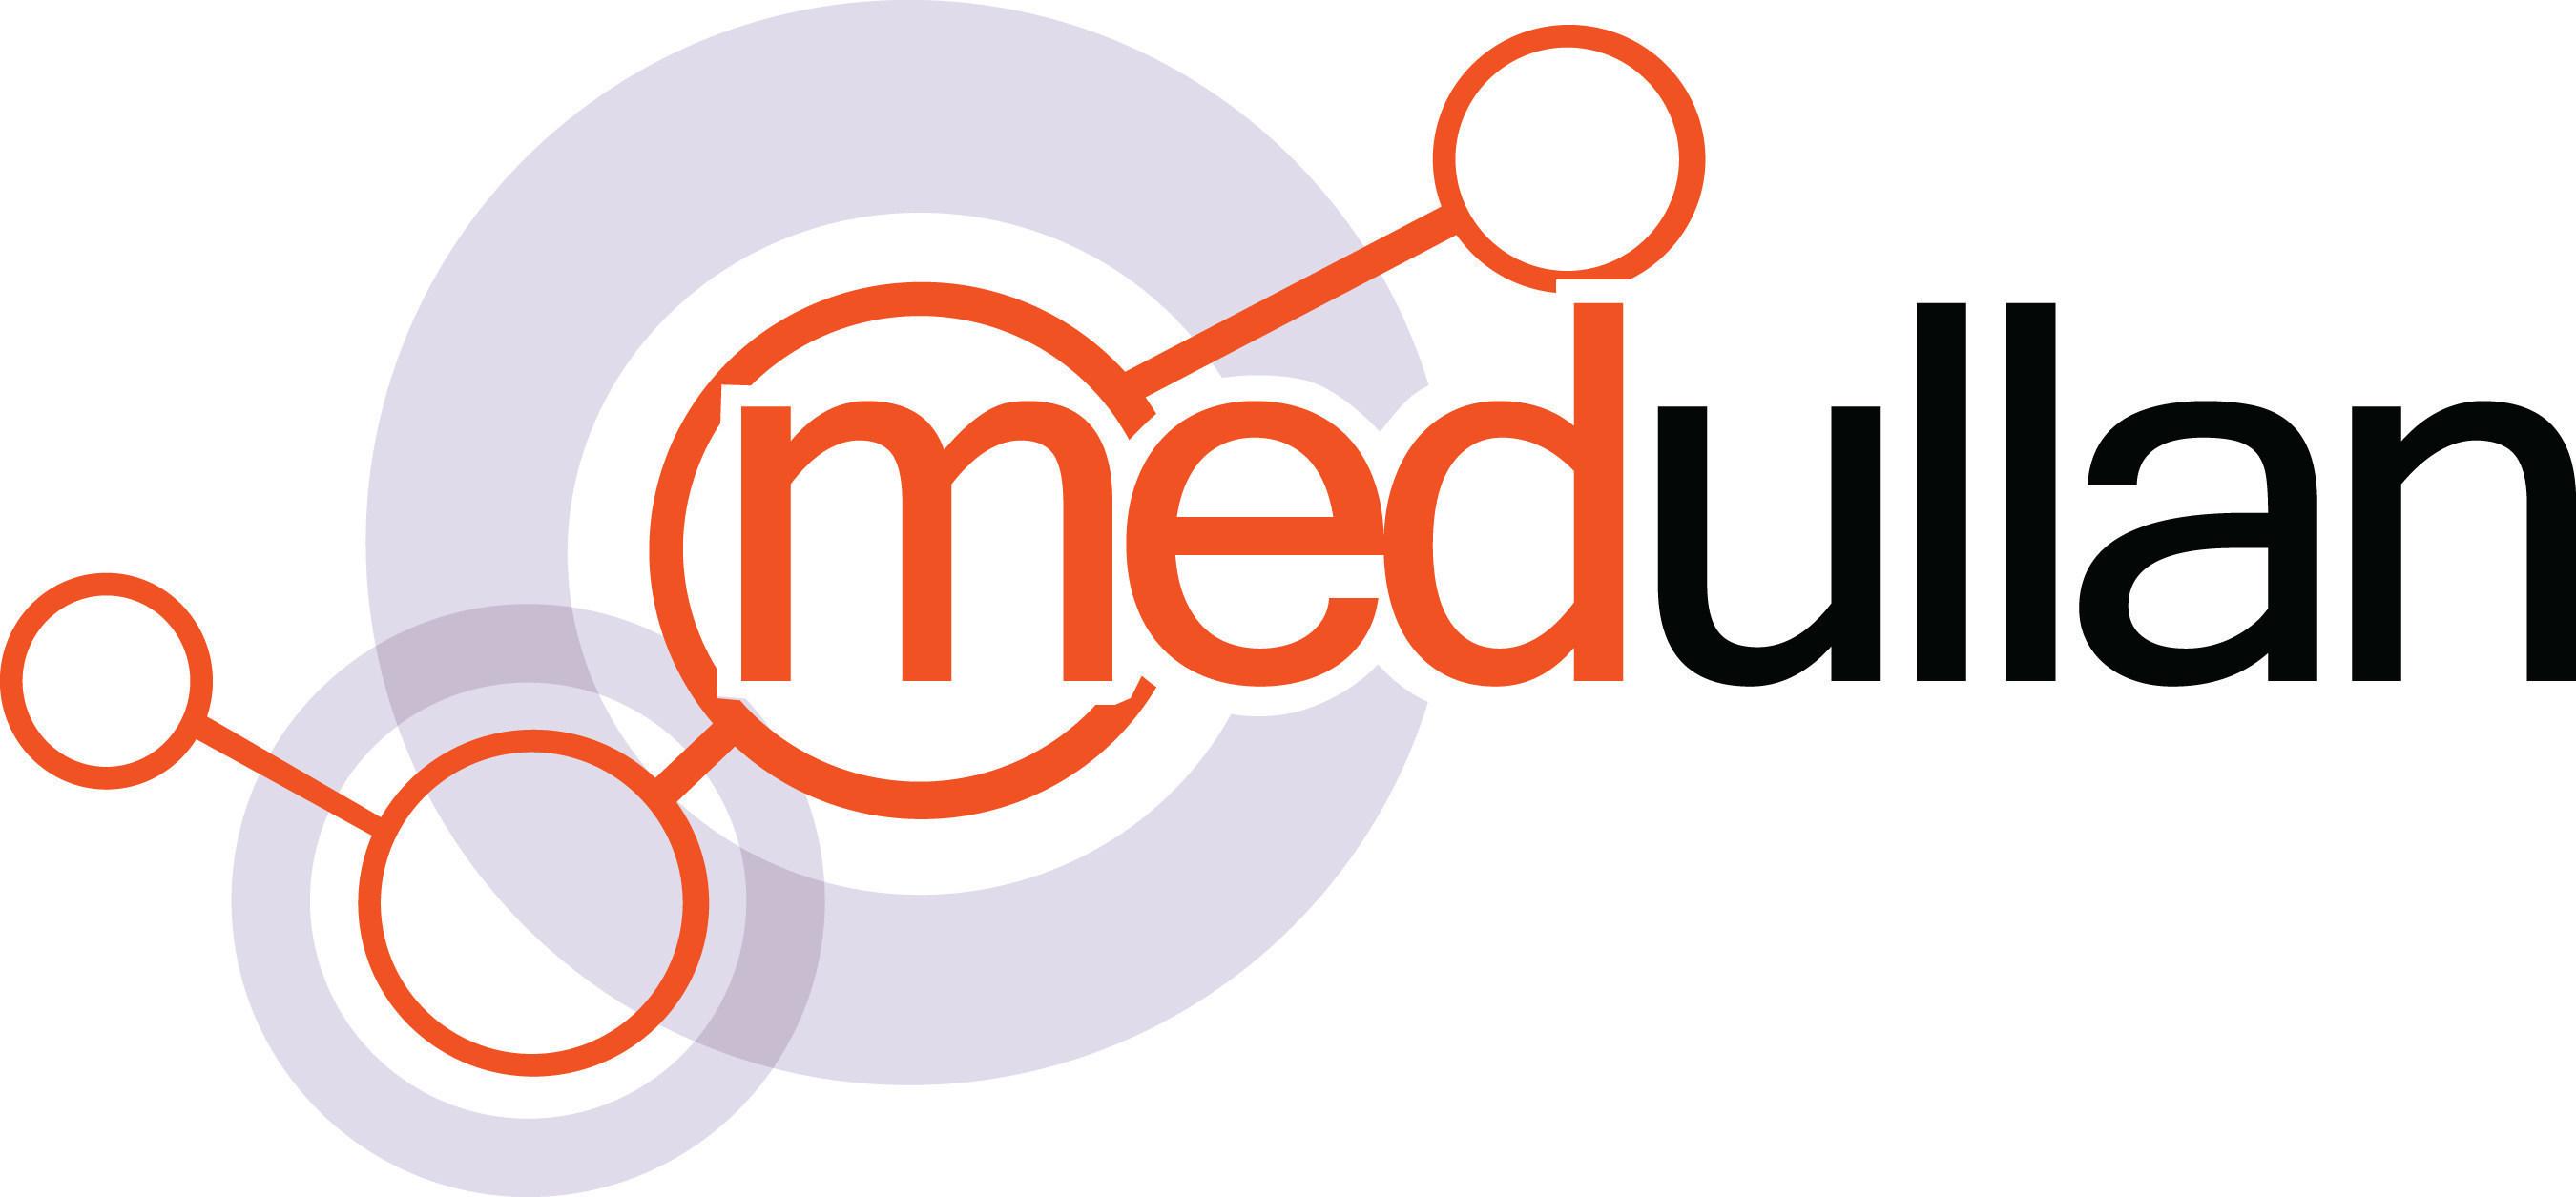 Medullan Celebrates a Decade of Digital Healthcare Innovation in Cambridge